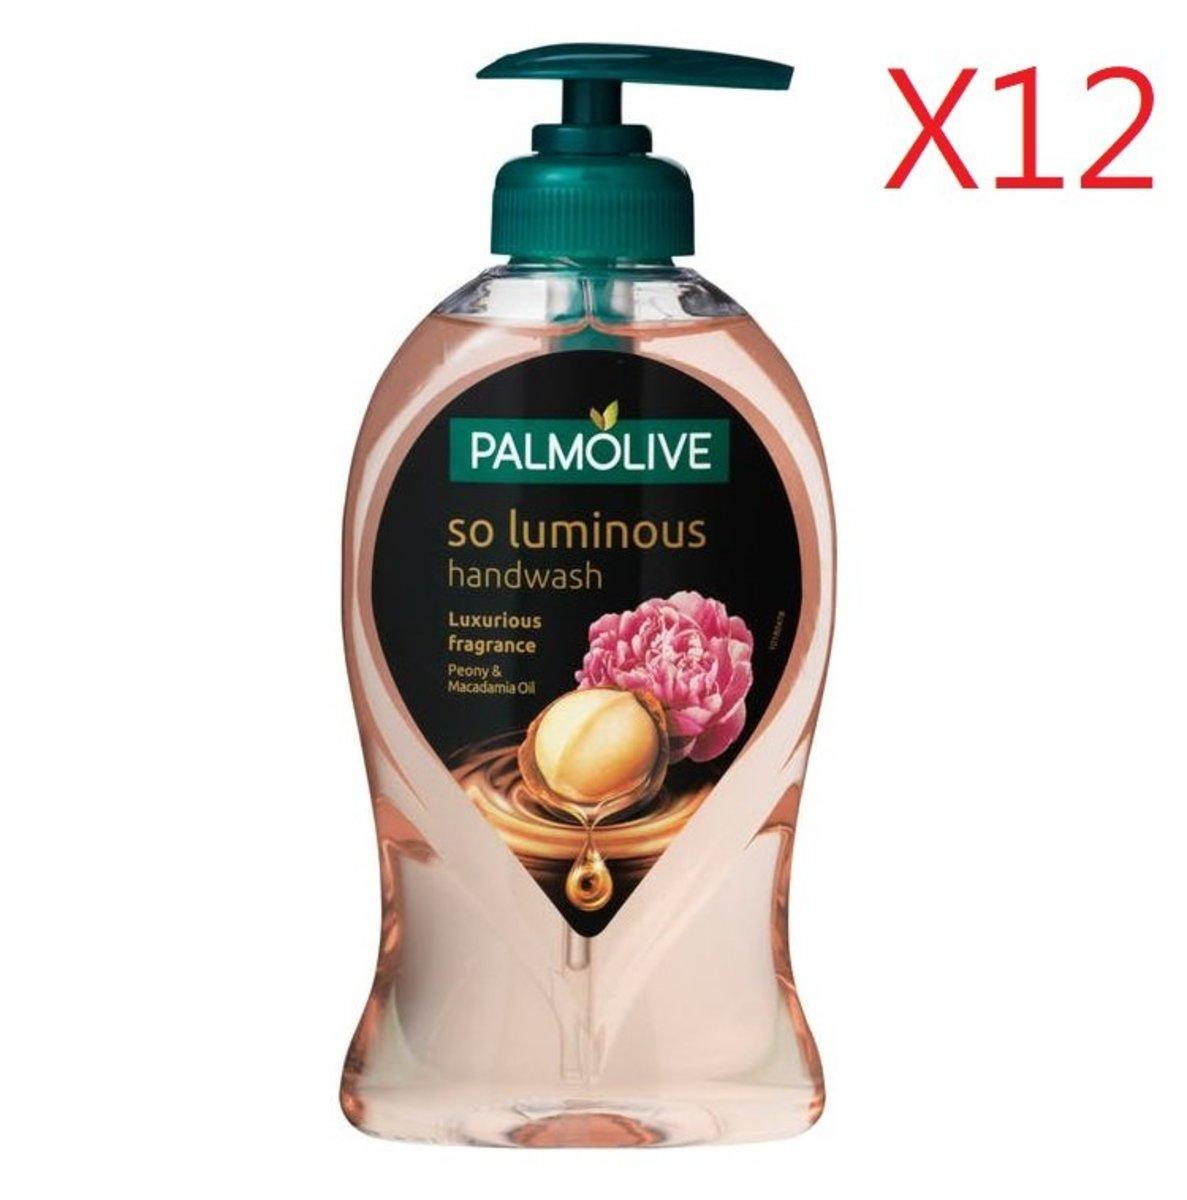 Palmoive 滋潤潔手液250ml - 牡丹+夏威夷果仁油 X 12支   [平行進口產品]